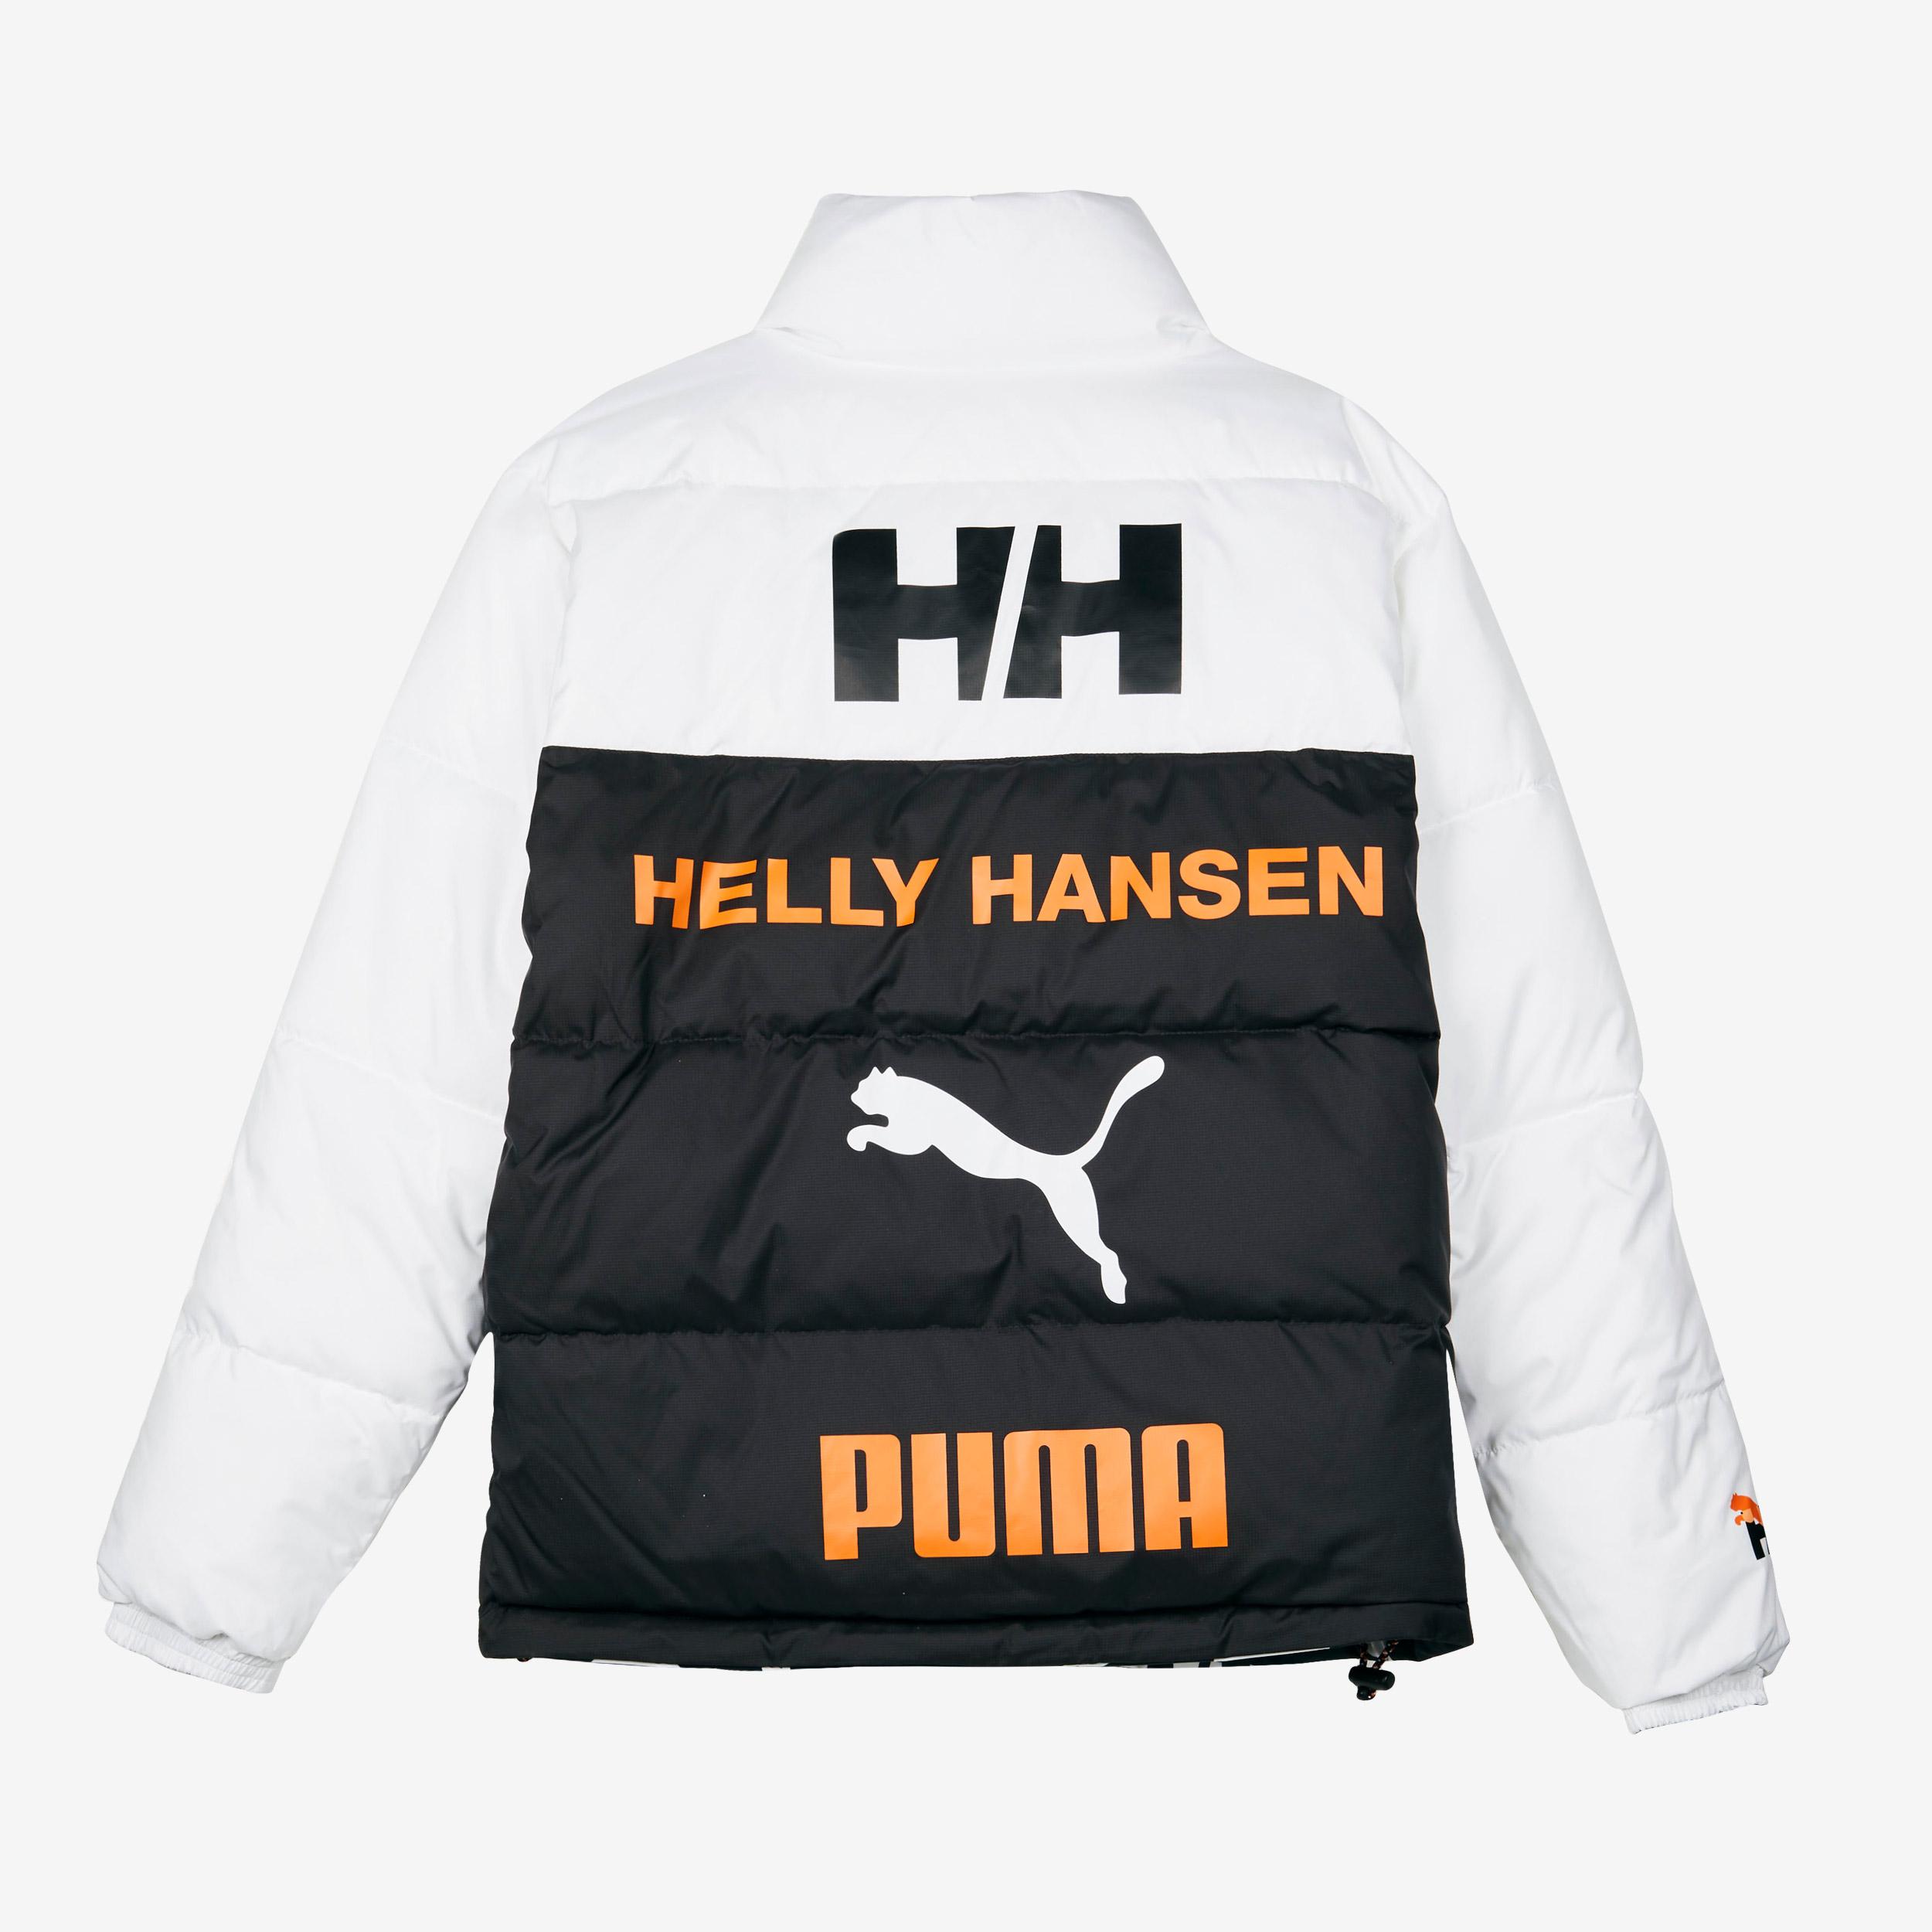 Puma PUMA x Helly Hansen Reversible Jacket - 597081-01 ...